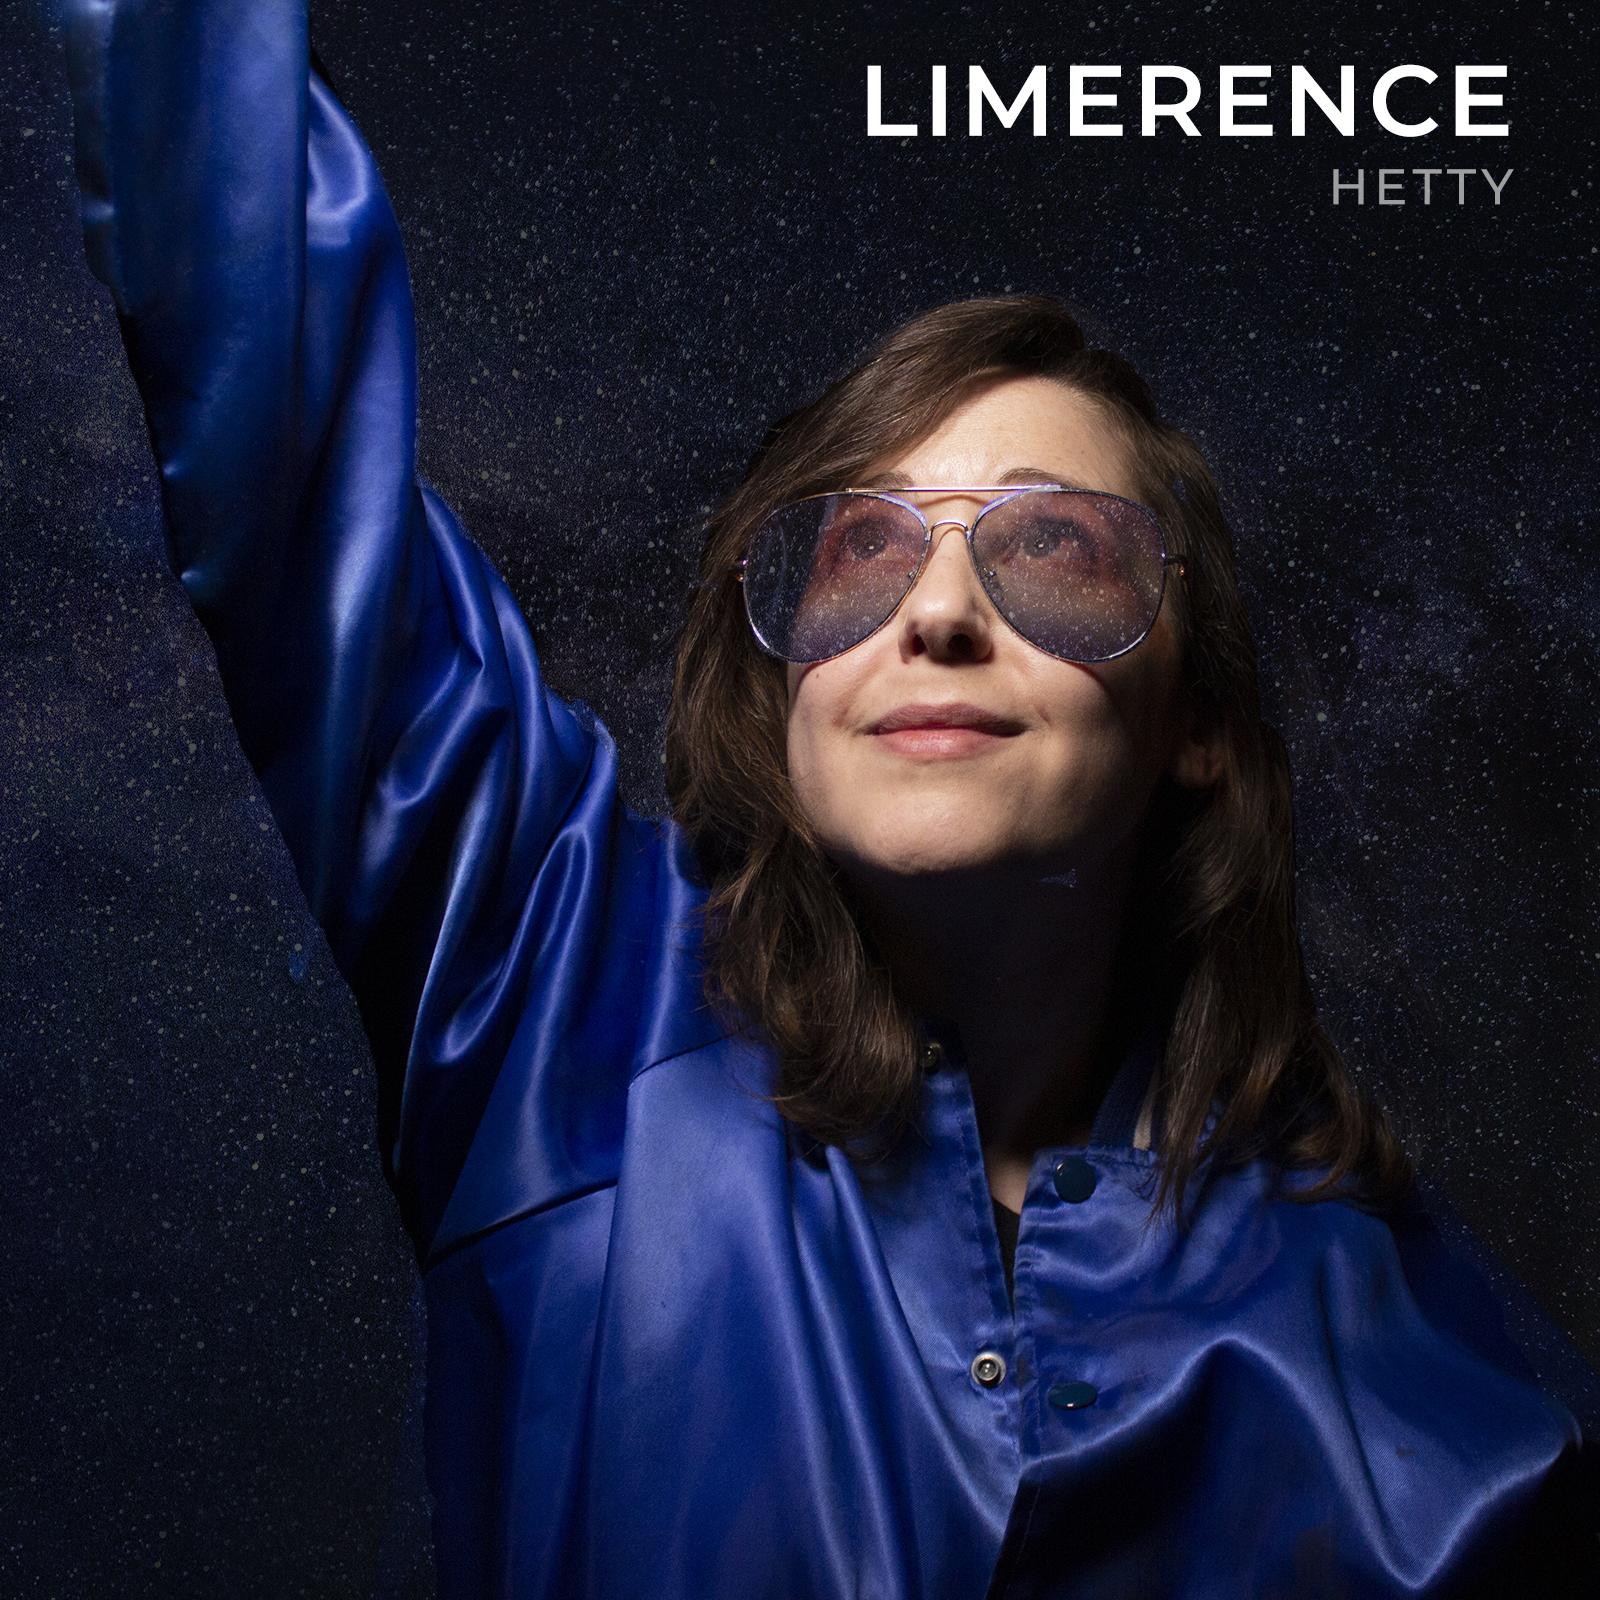 Limerence_AlbumCover3.jpg